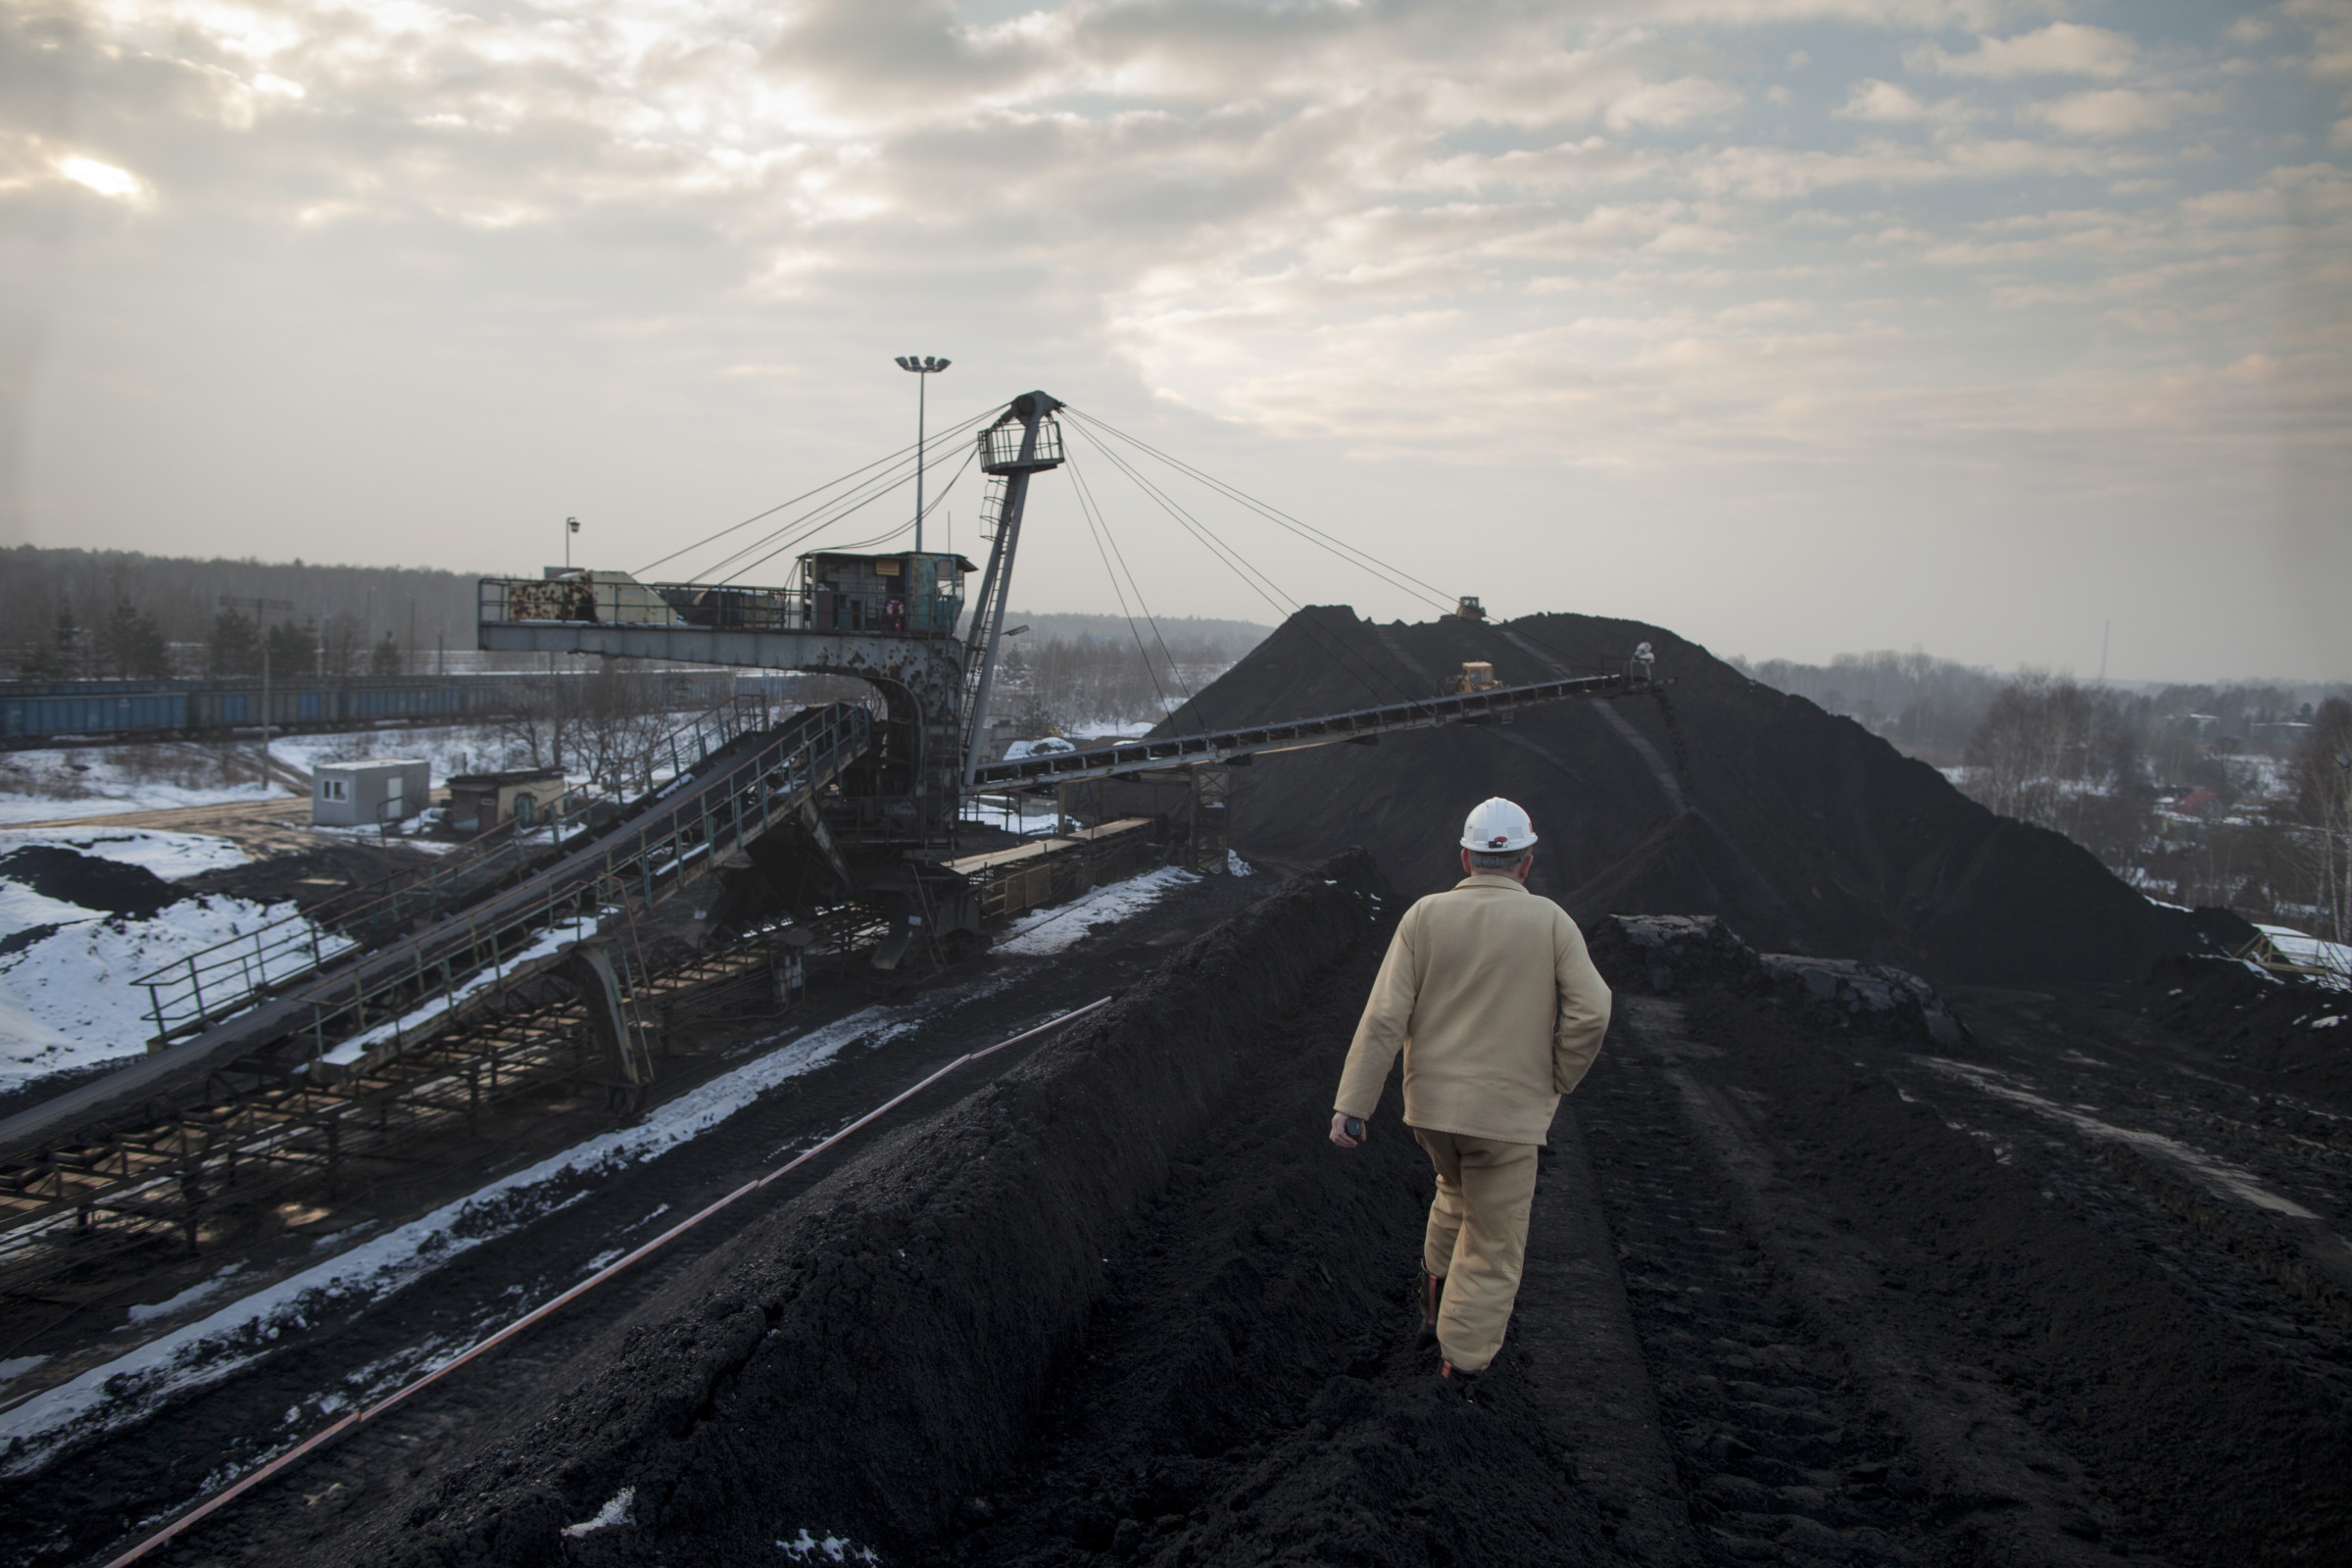 A worker walks across a storage dump of coking coal as a conveyor belt deposits newly processed coal at the Bielszowice mine, operated by Kompania Weglowa SA, in Ruda Slaska, Poland. Photographer: Bartek Sadowski/Bloomberg